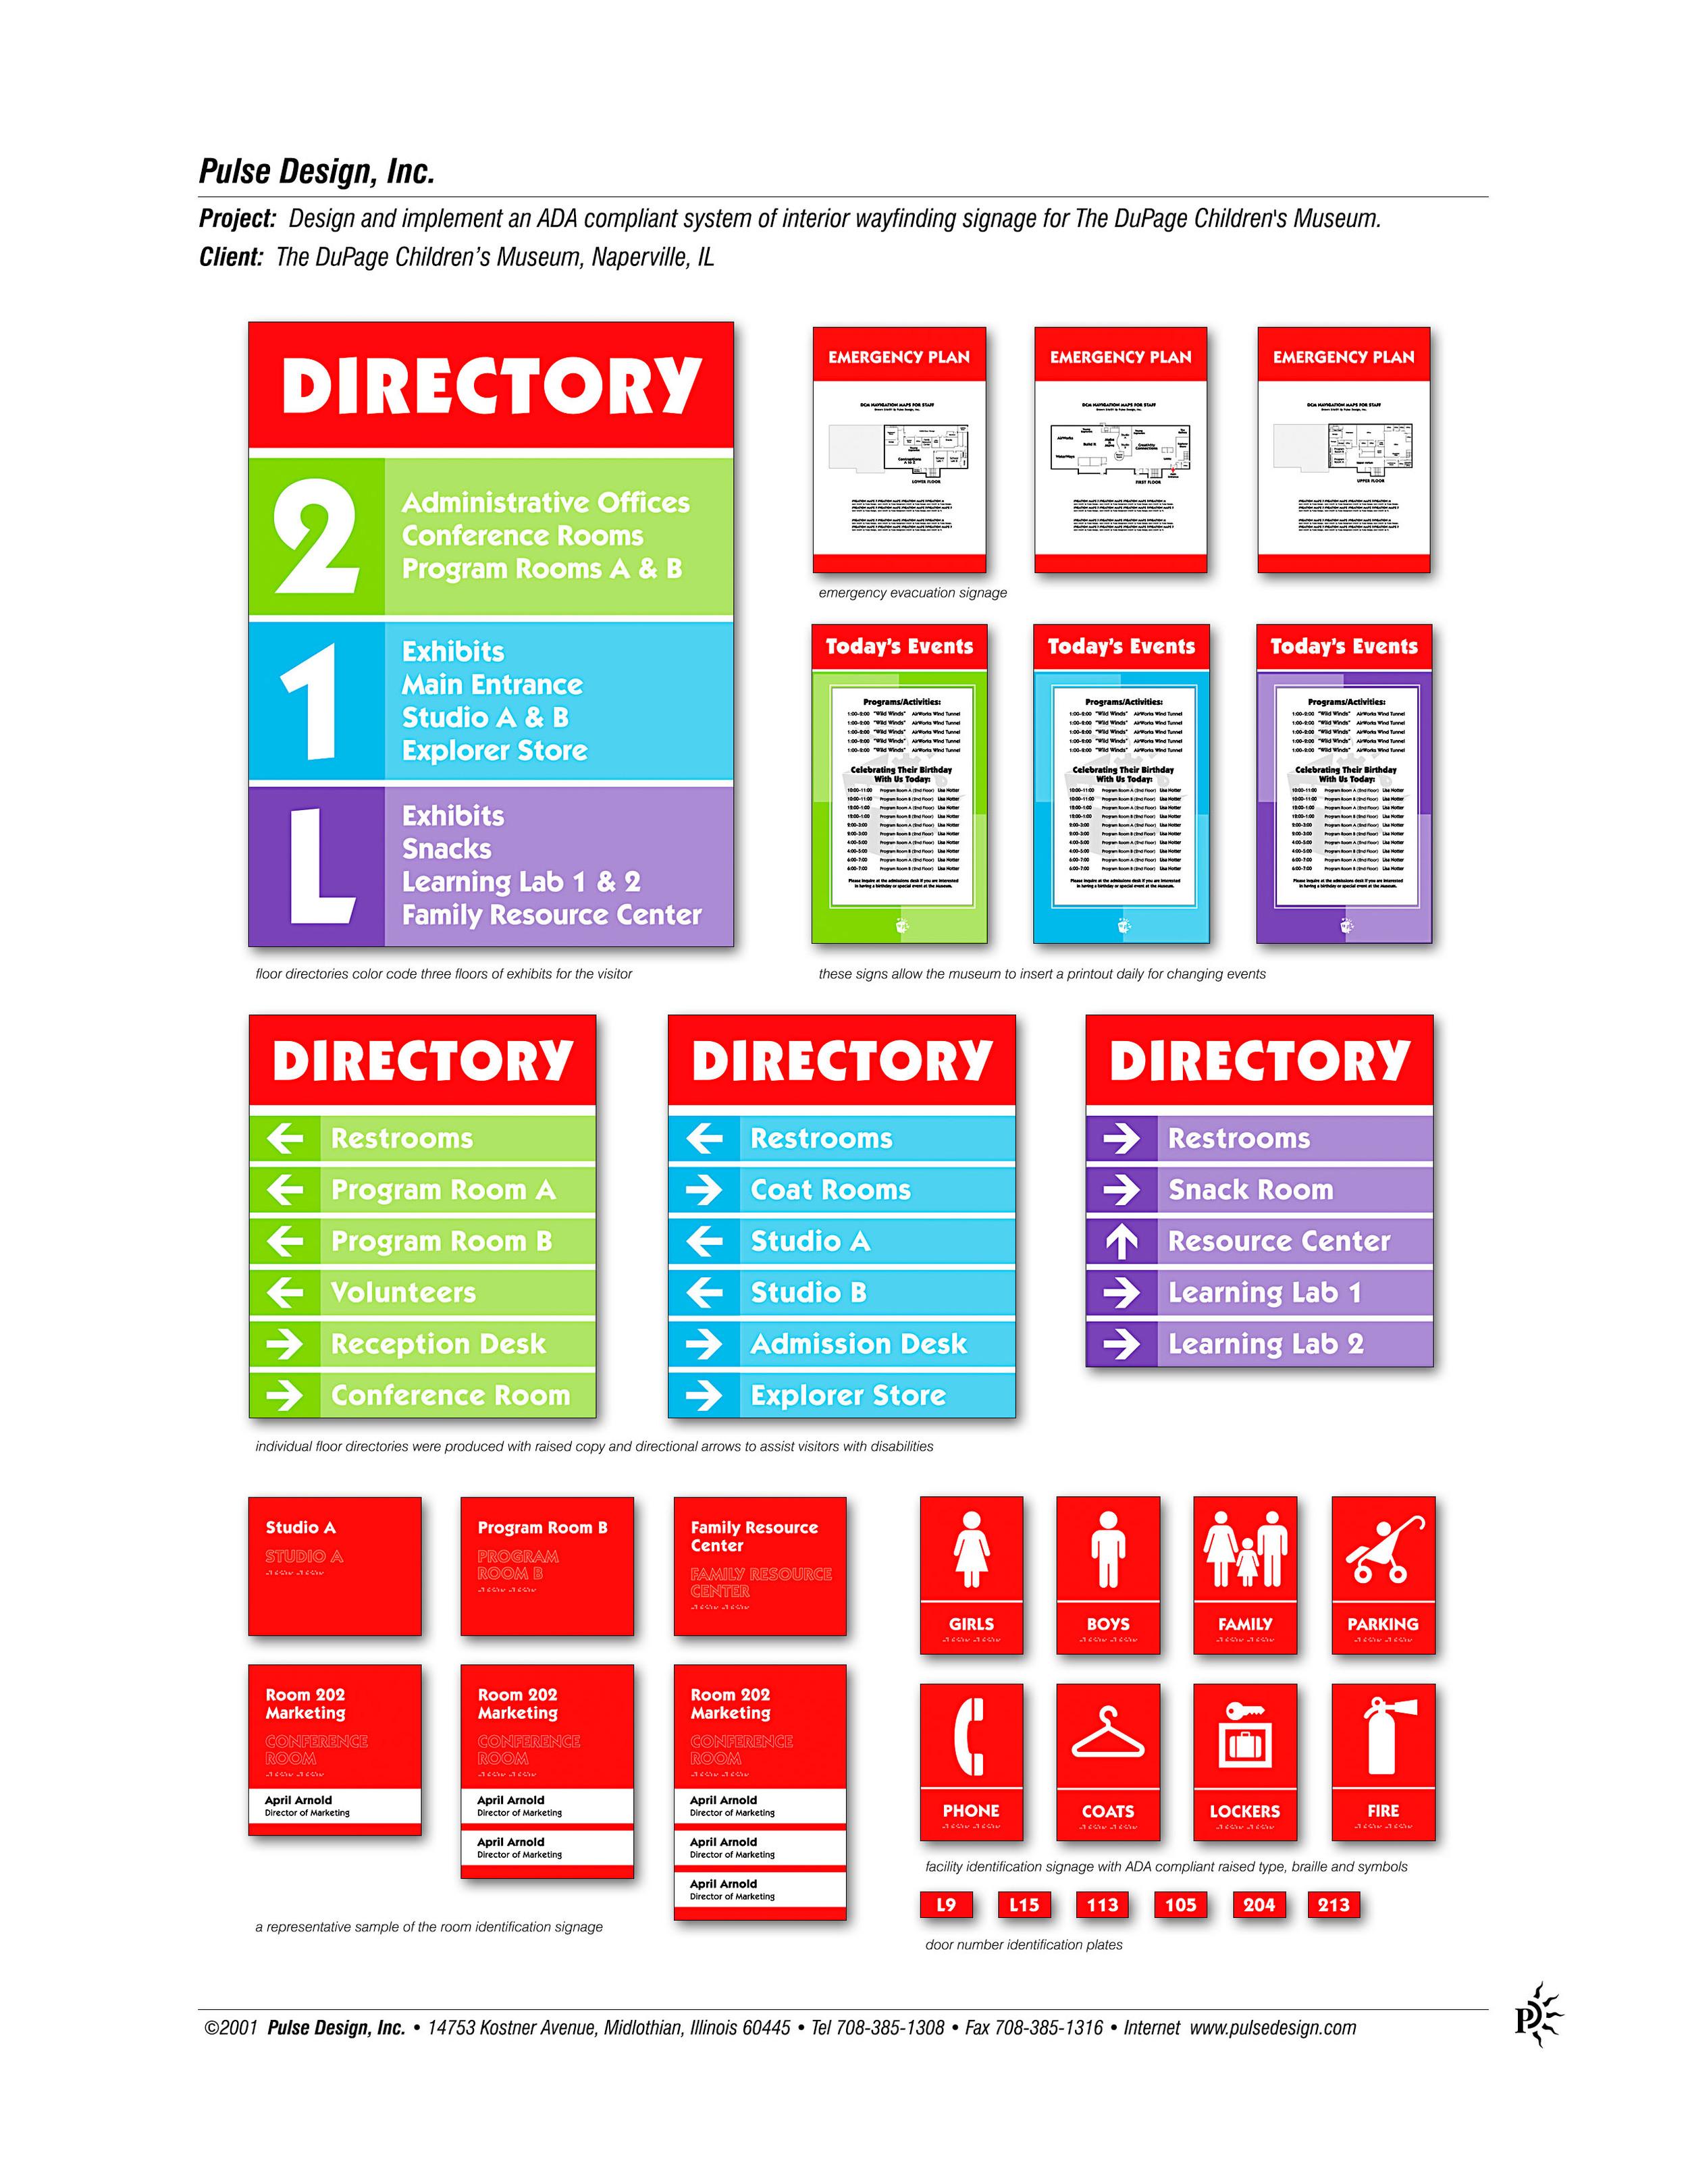 DCM-Wayfinding-Internal-Pulse-Design-Inc.jpg